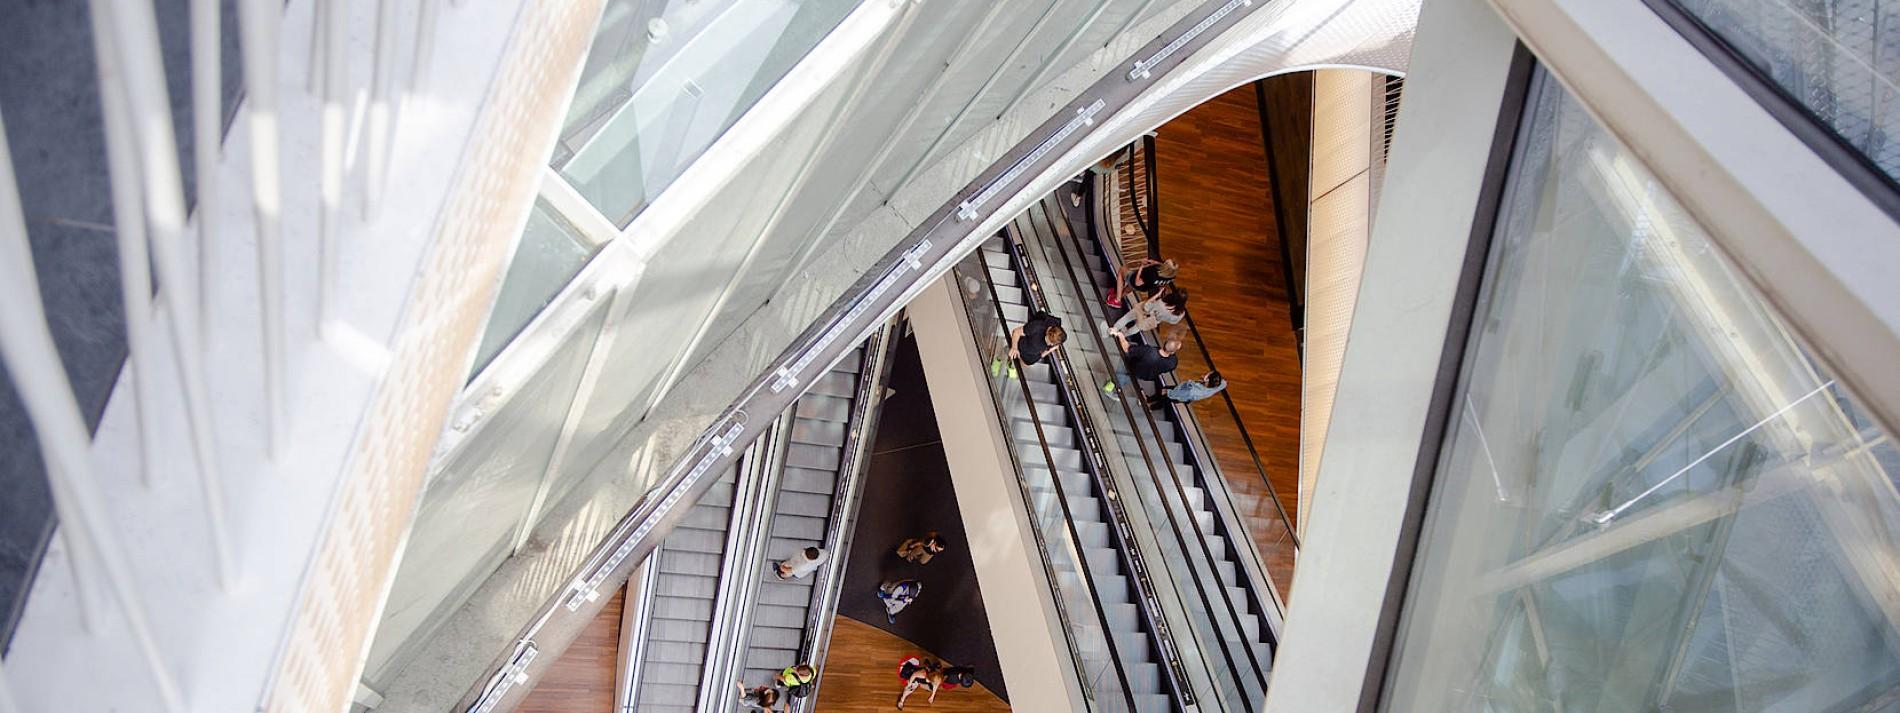 Shopping-Center in der Krise